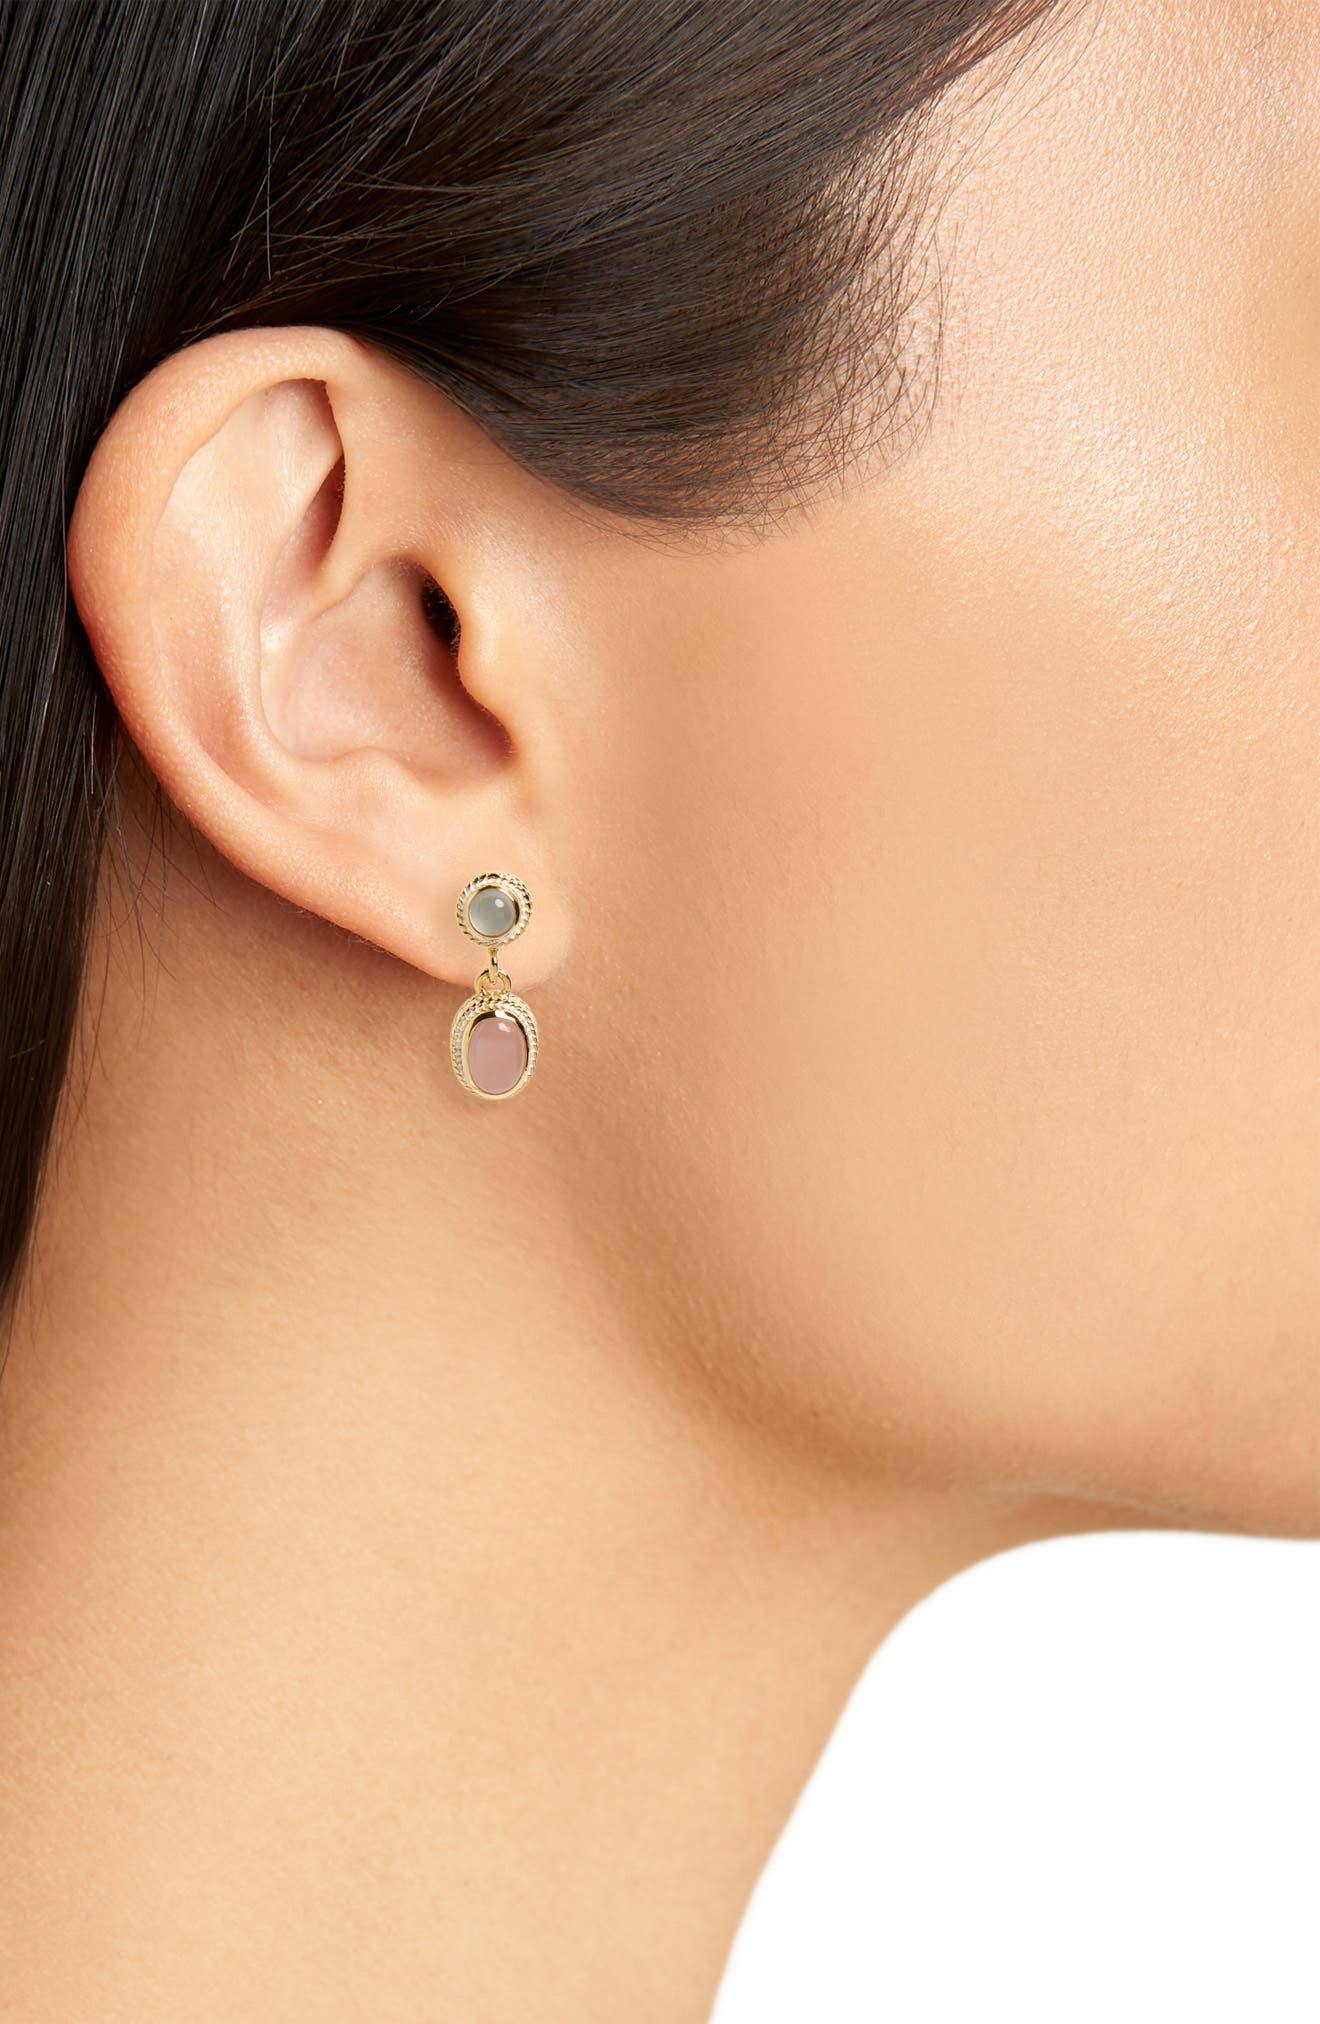 Double Drop Pearl Earrings,                             Alternate thumbnail 2, color,                             Gold/ Guava Quartz/ Moonstone